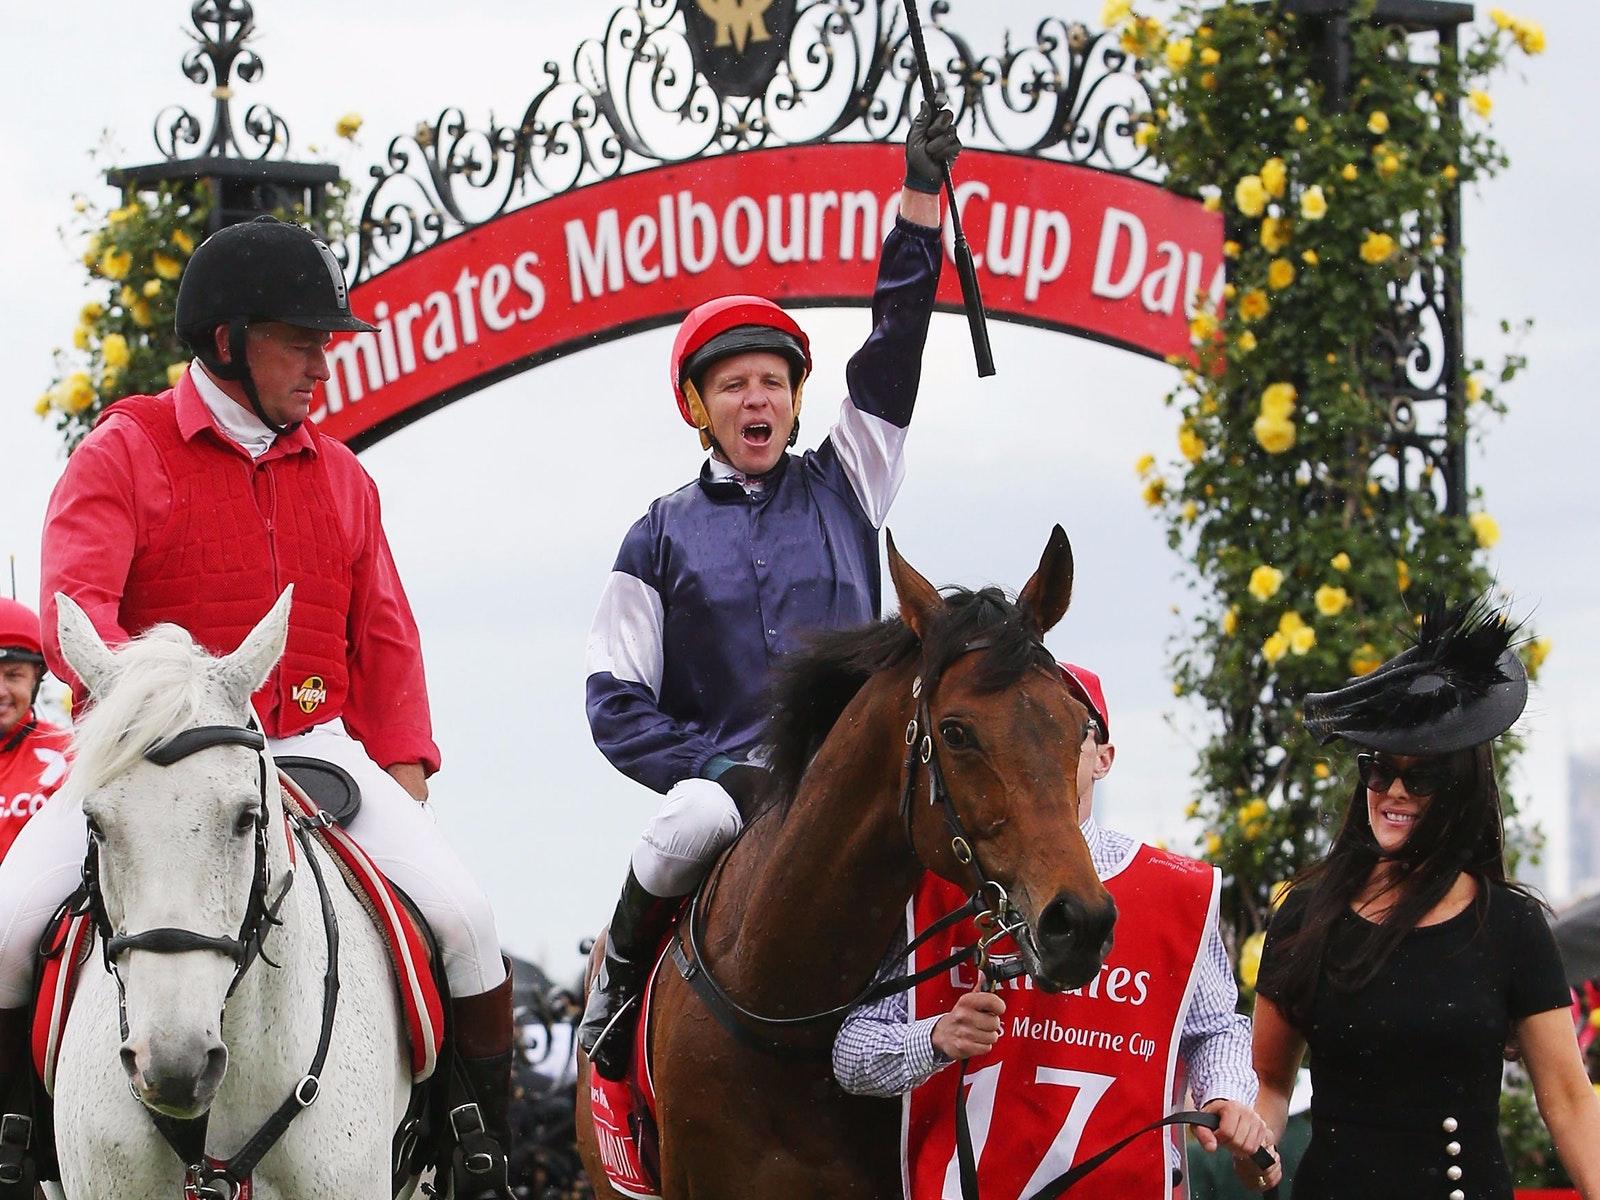 2016 Emirates Melbourne Cup winner, Almandin